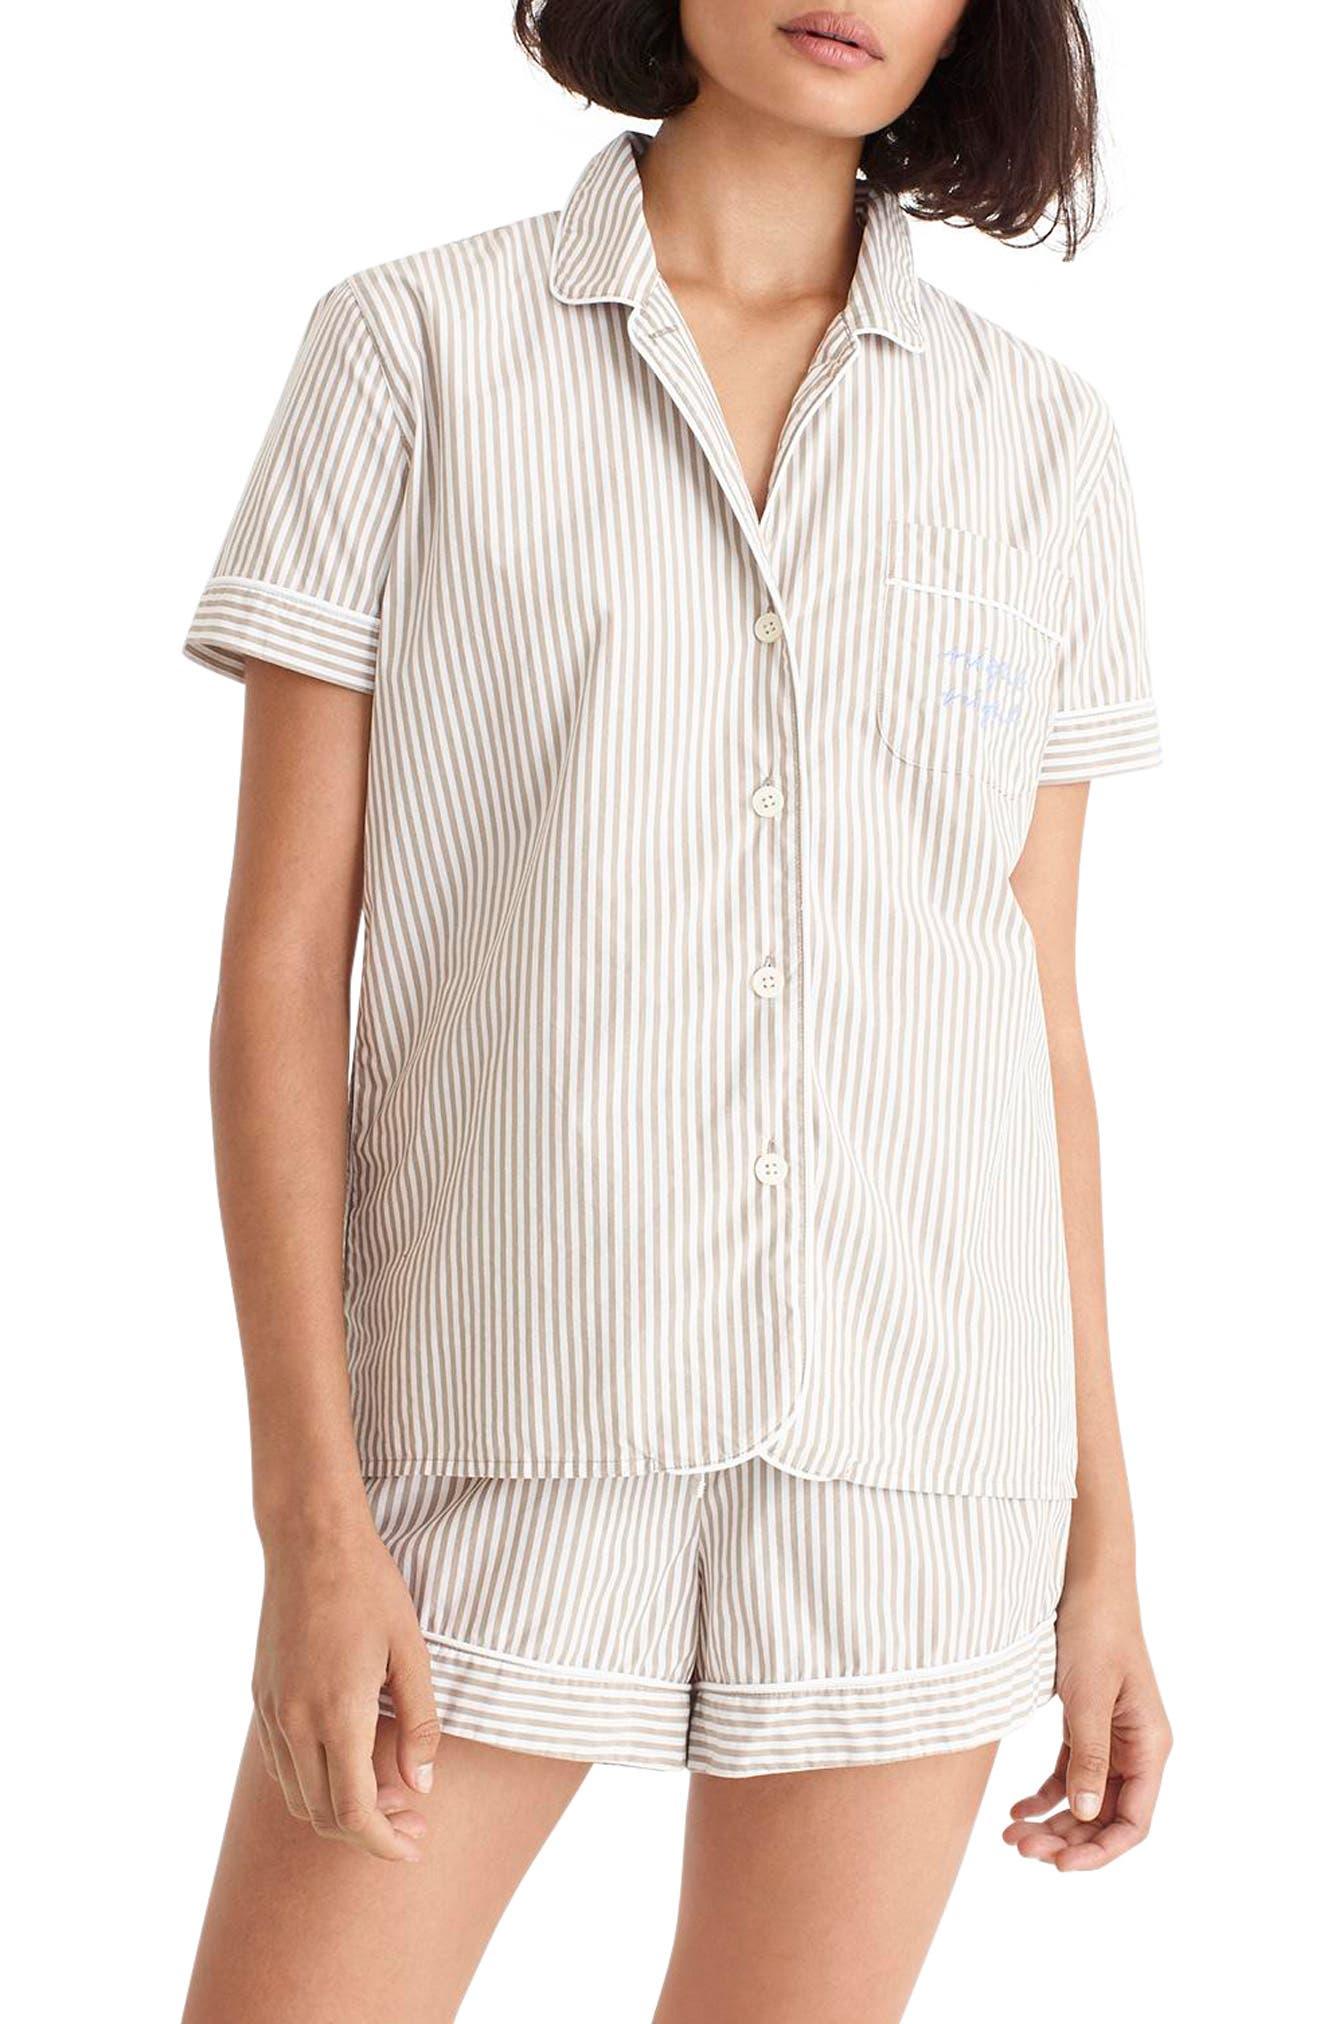 Night Night Short Pajamas,                             Main thumbnail 1, color,                             TAN WHITE STRIPE